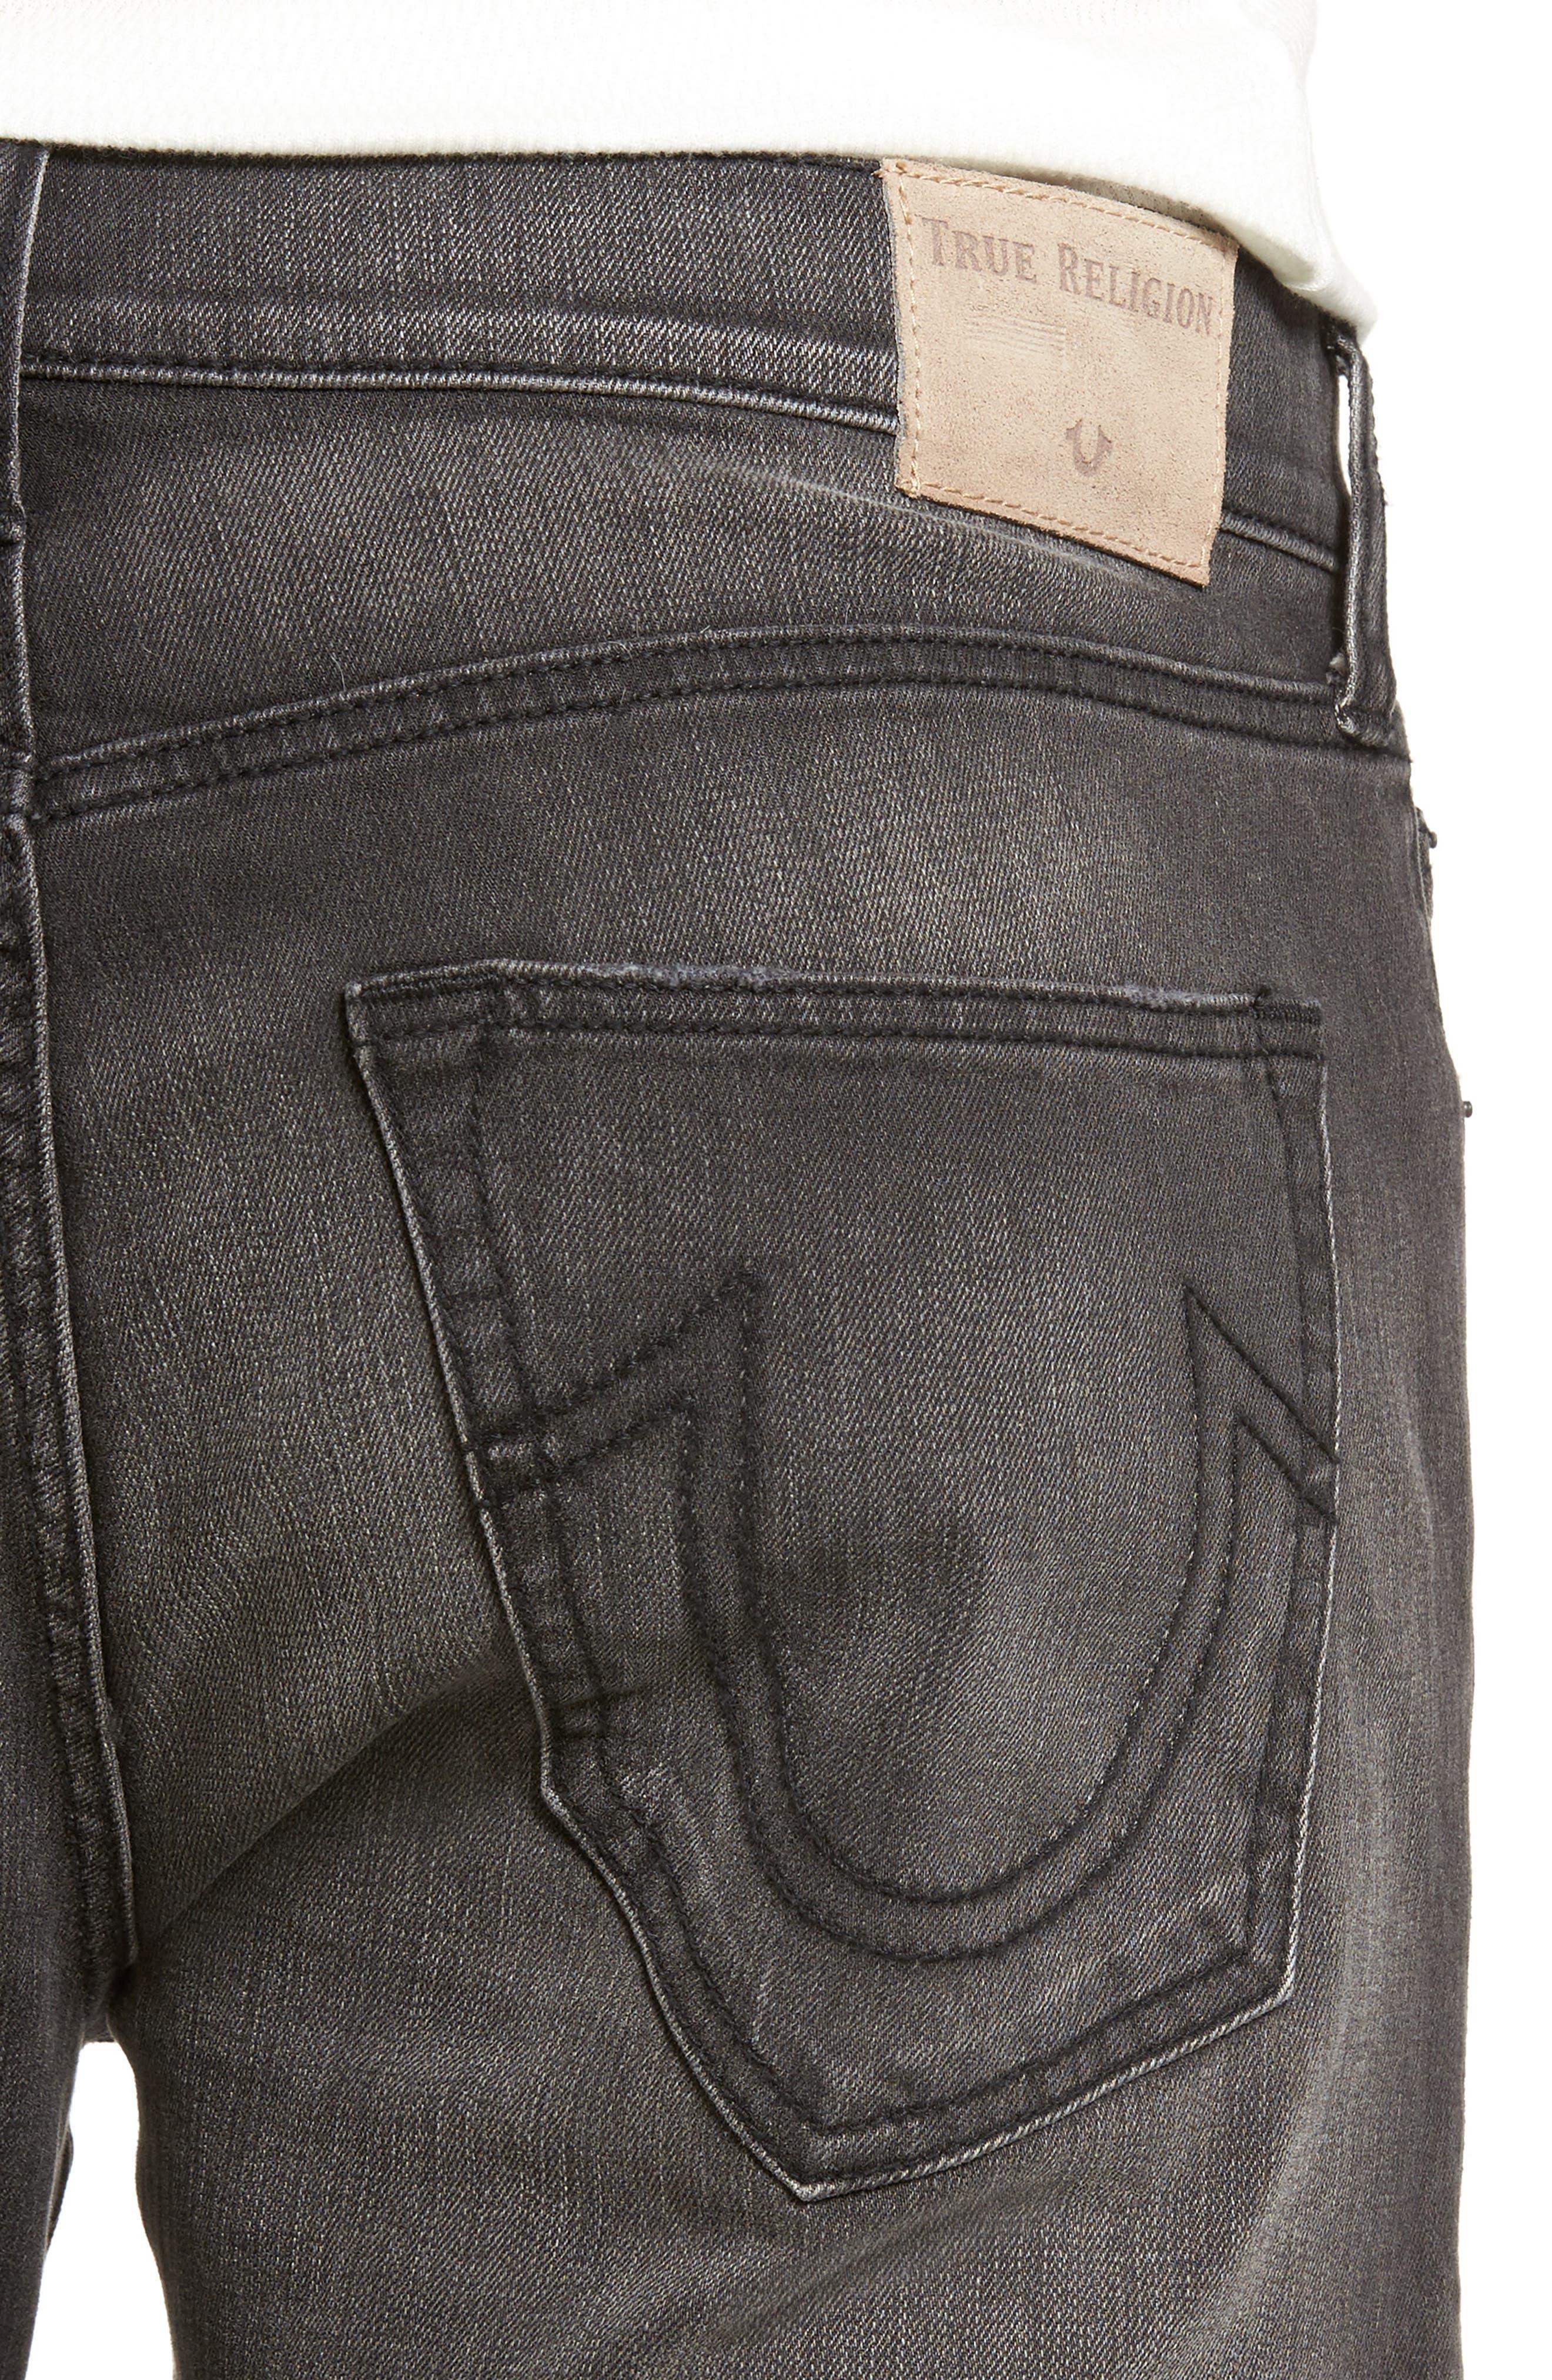 Geno Straight Leg Jeans,                             Alternate thumbnail 4, color,                             DARK REBEL RACE